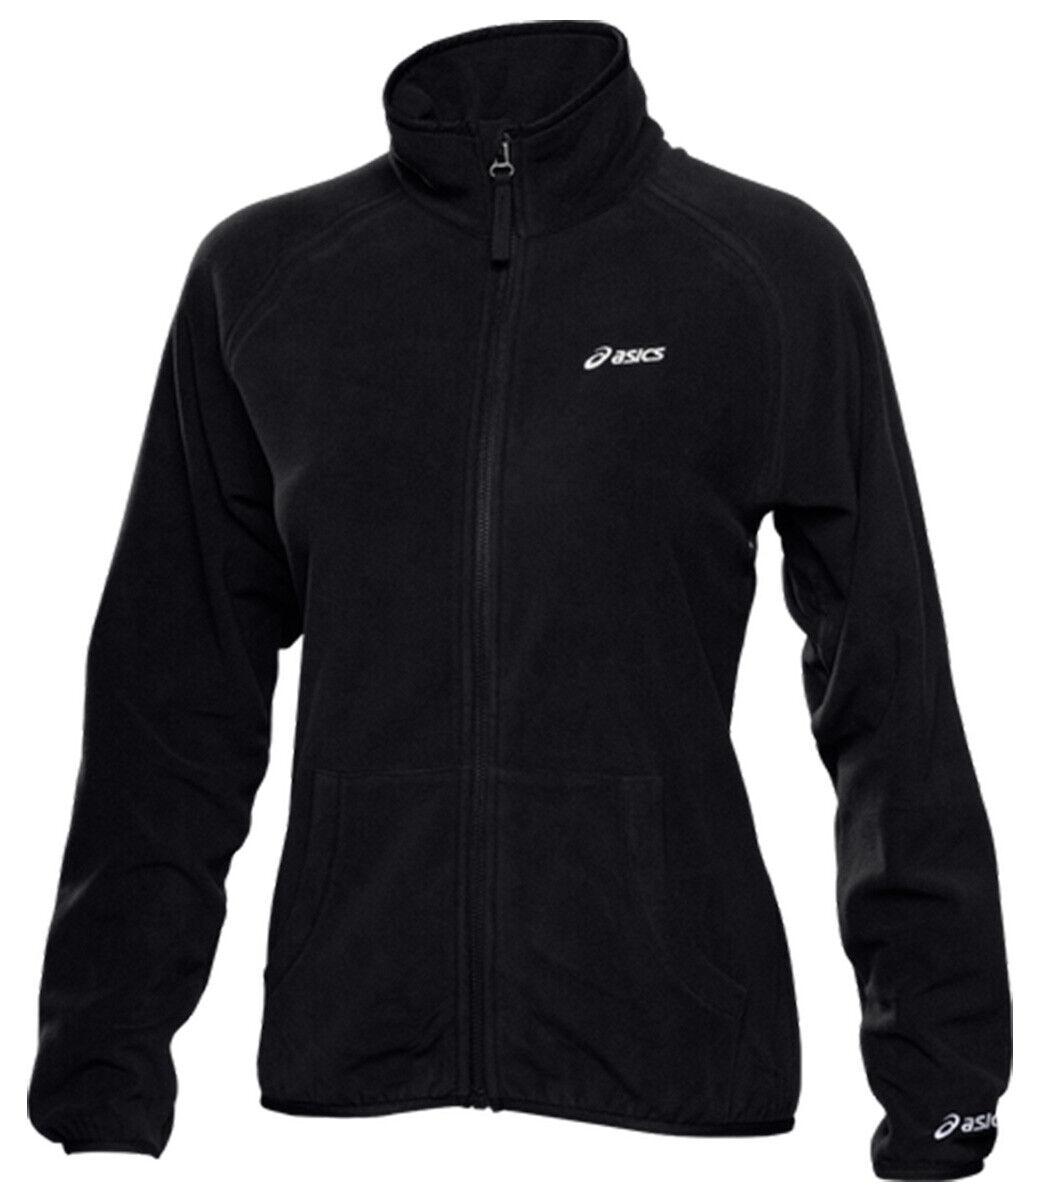 Asics Men's Fleece Jacket Full Zip Zipped Pockets Fleece Jacket - Black - New